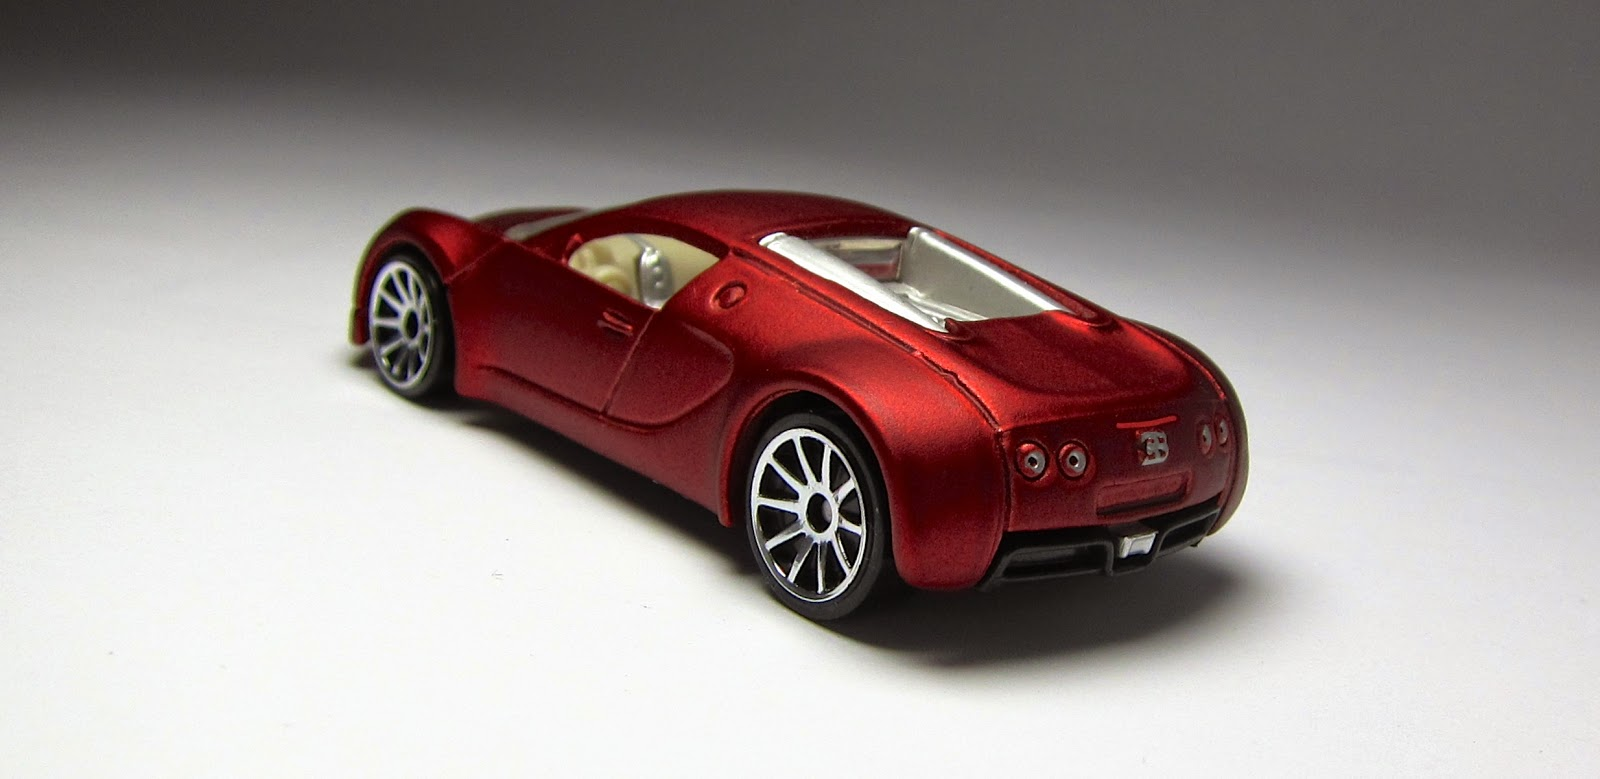 Model of the Day: 2010 Hot Wheels Walmart Exclusive Bugatti Veyron… - theLamleyGroup